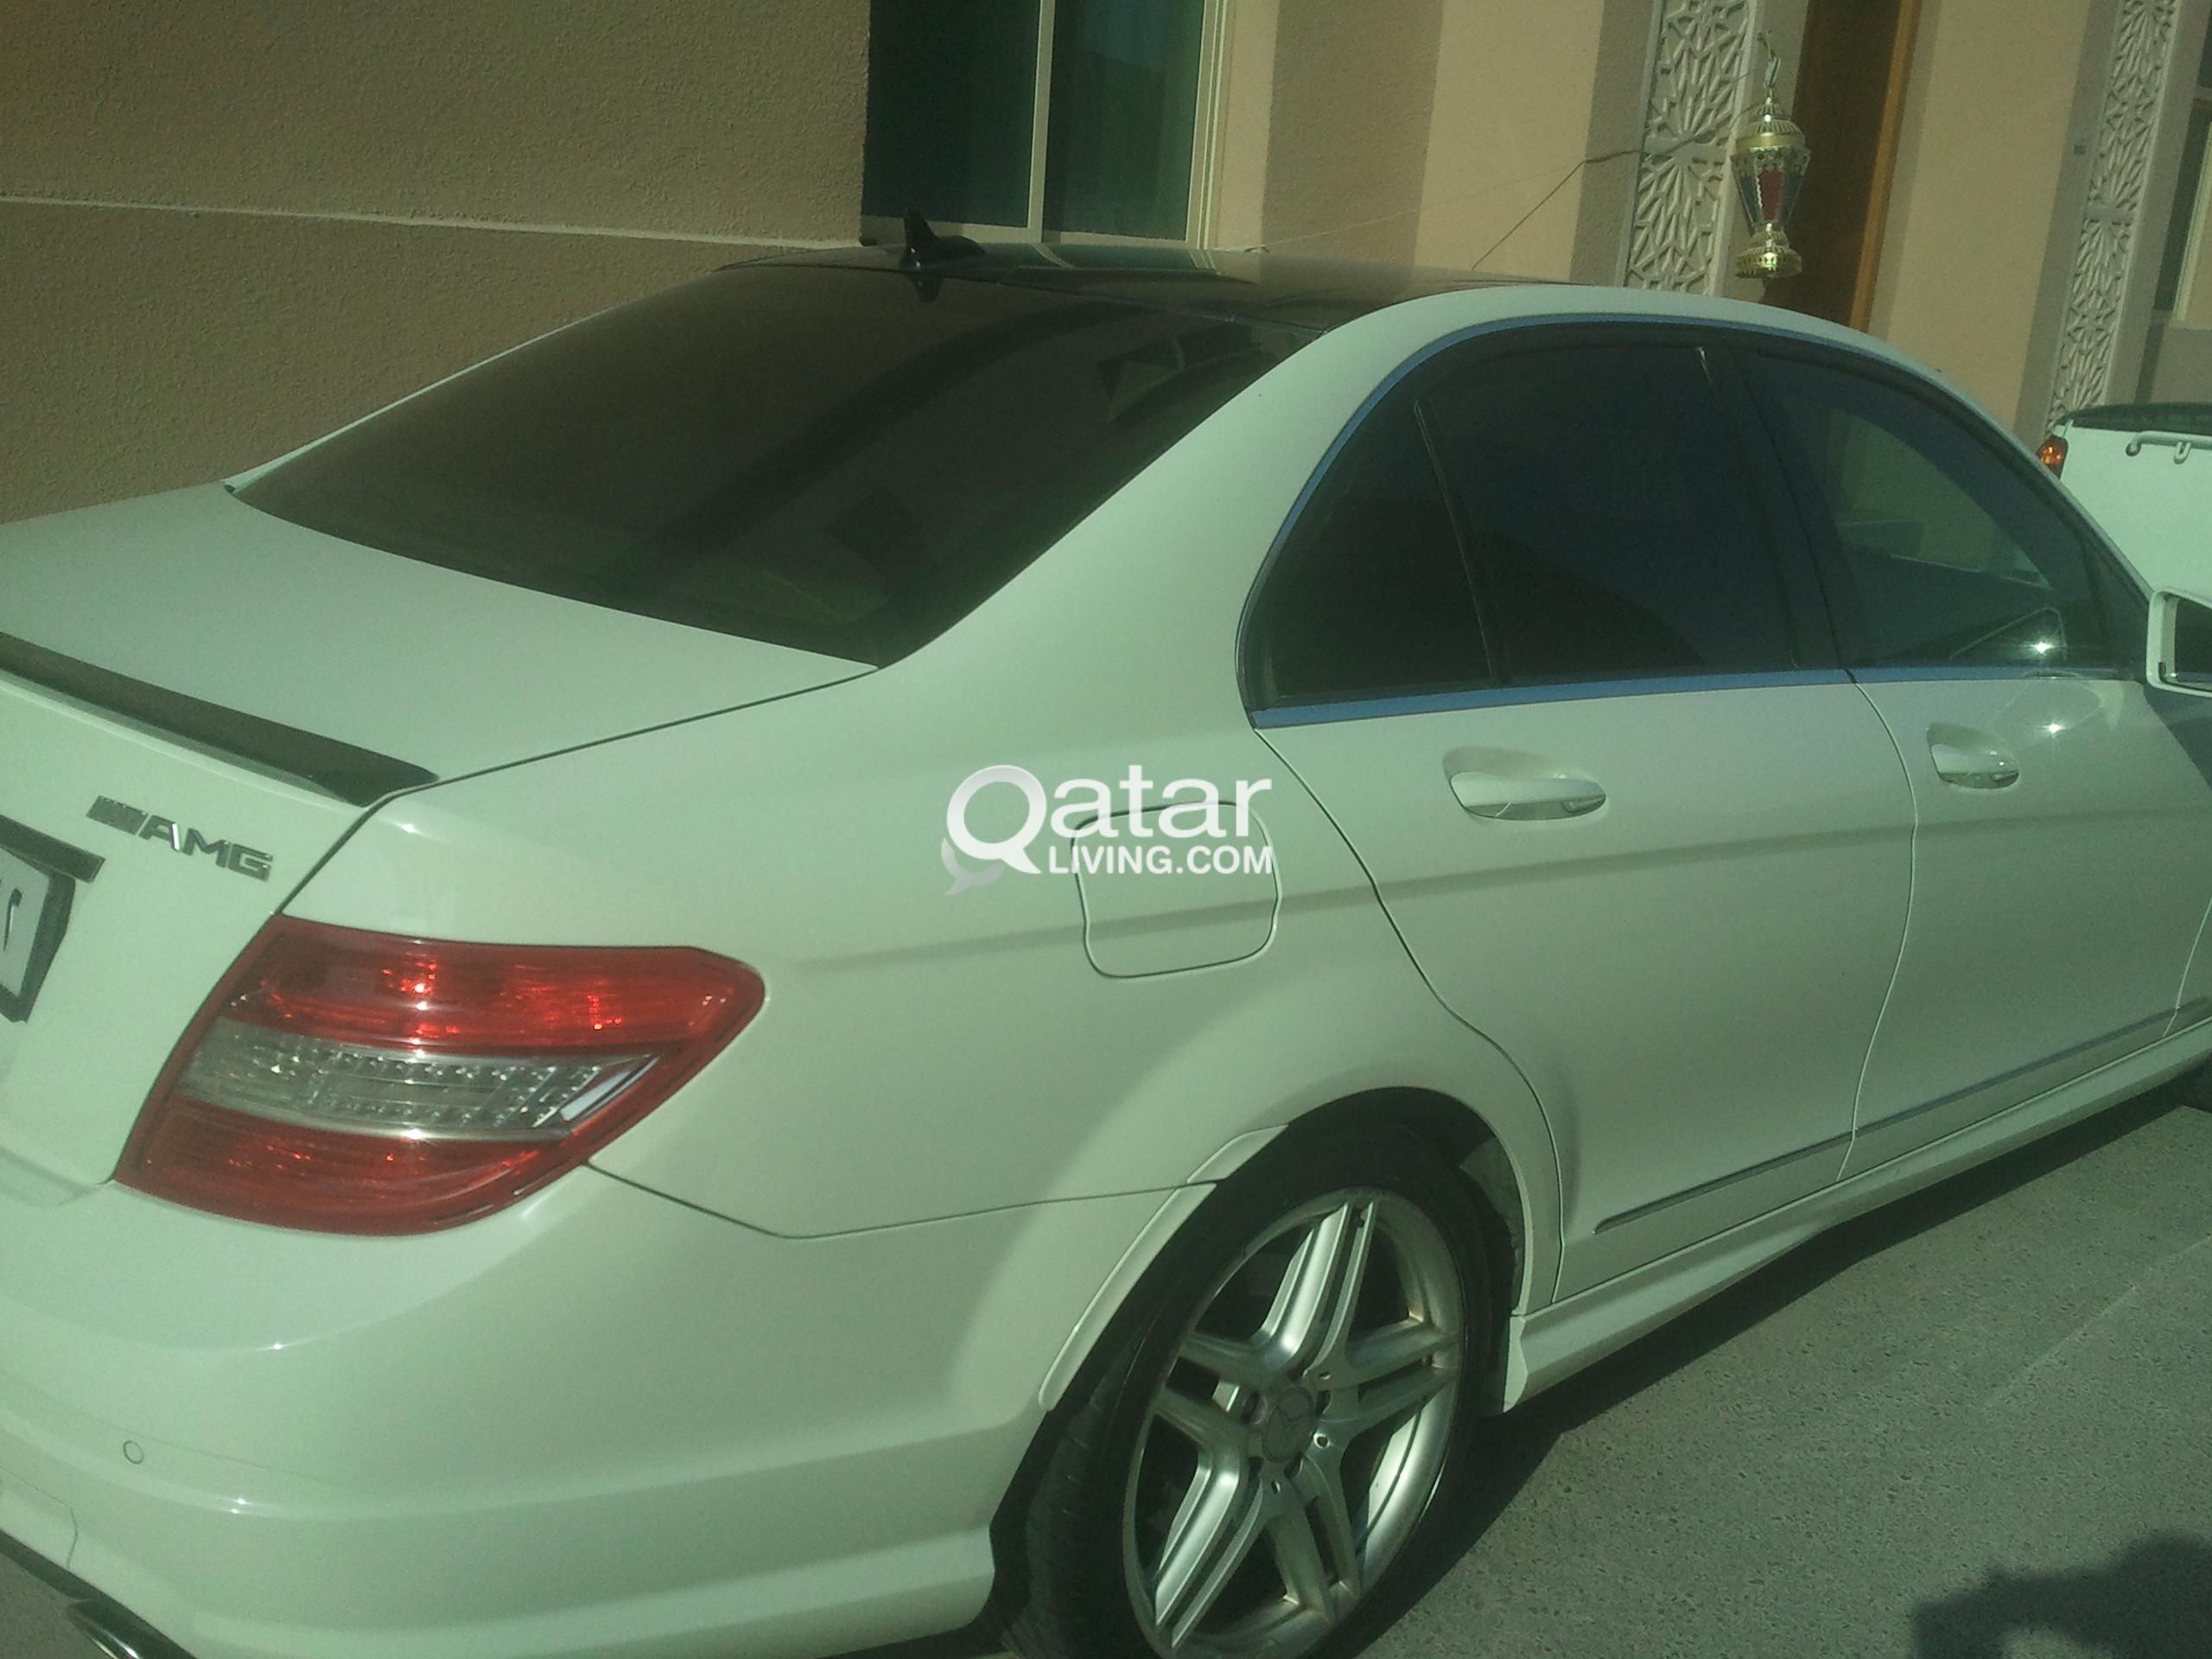 Mercedes Benz C350 Amg 2009 Qatar Living Title